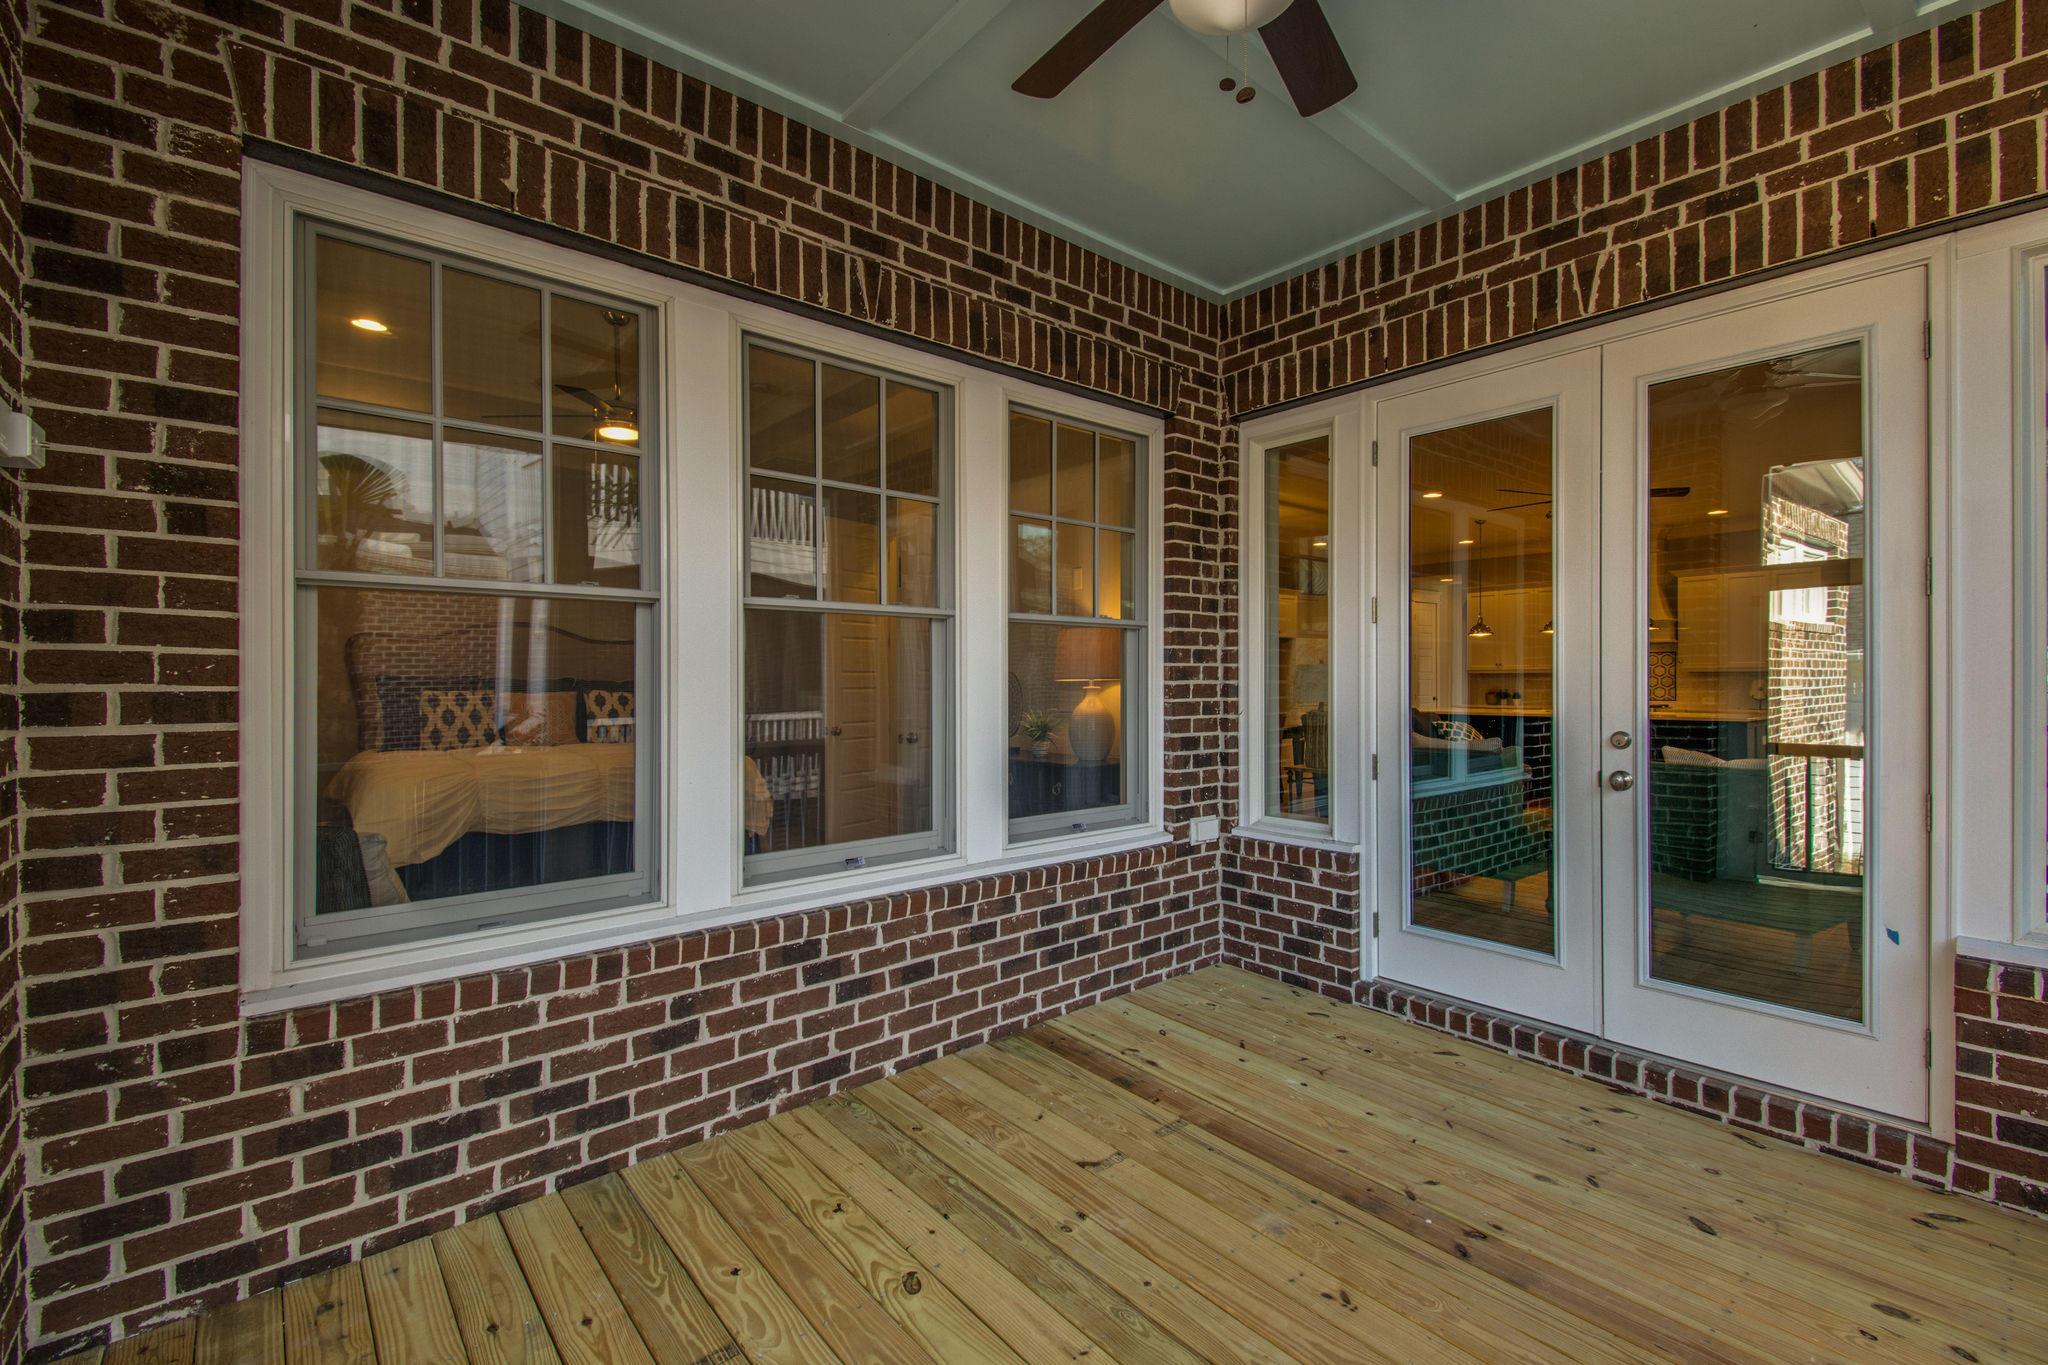 Daniel Island Park Homes For Sale - 112 Brailsford, Charleston, SC - 6